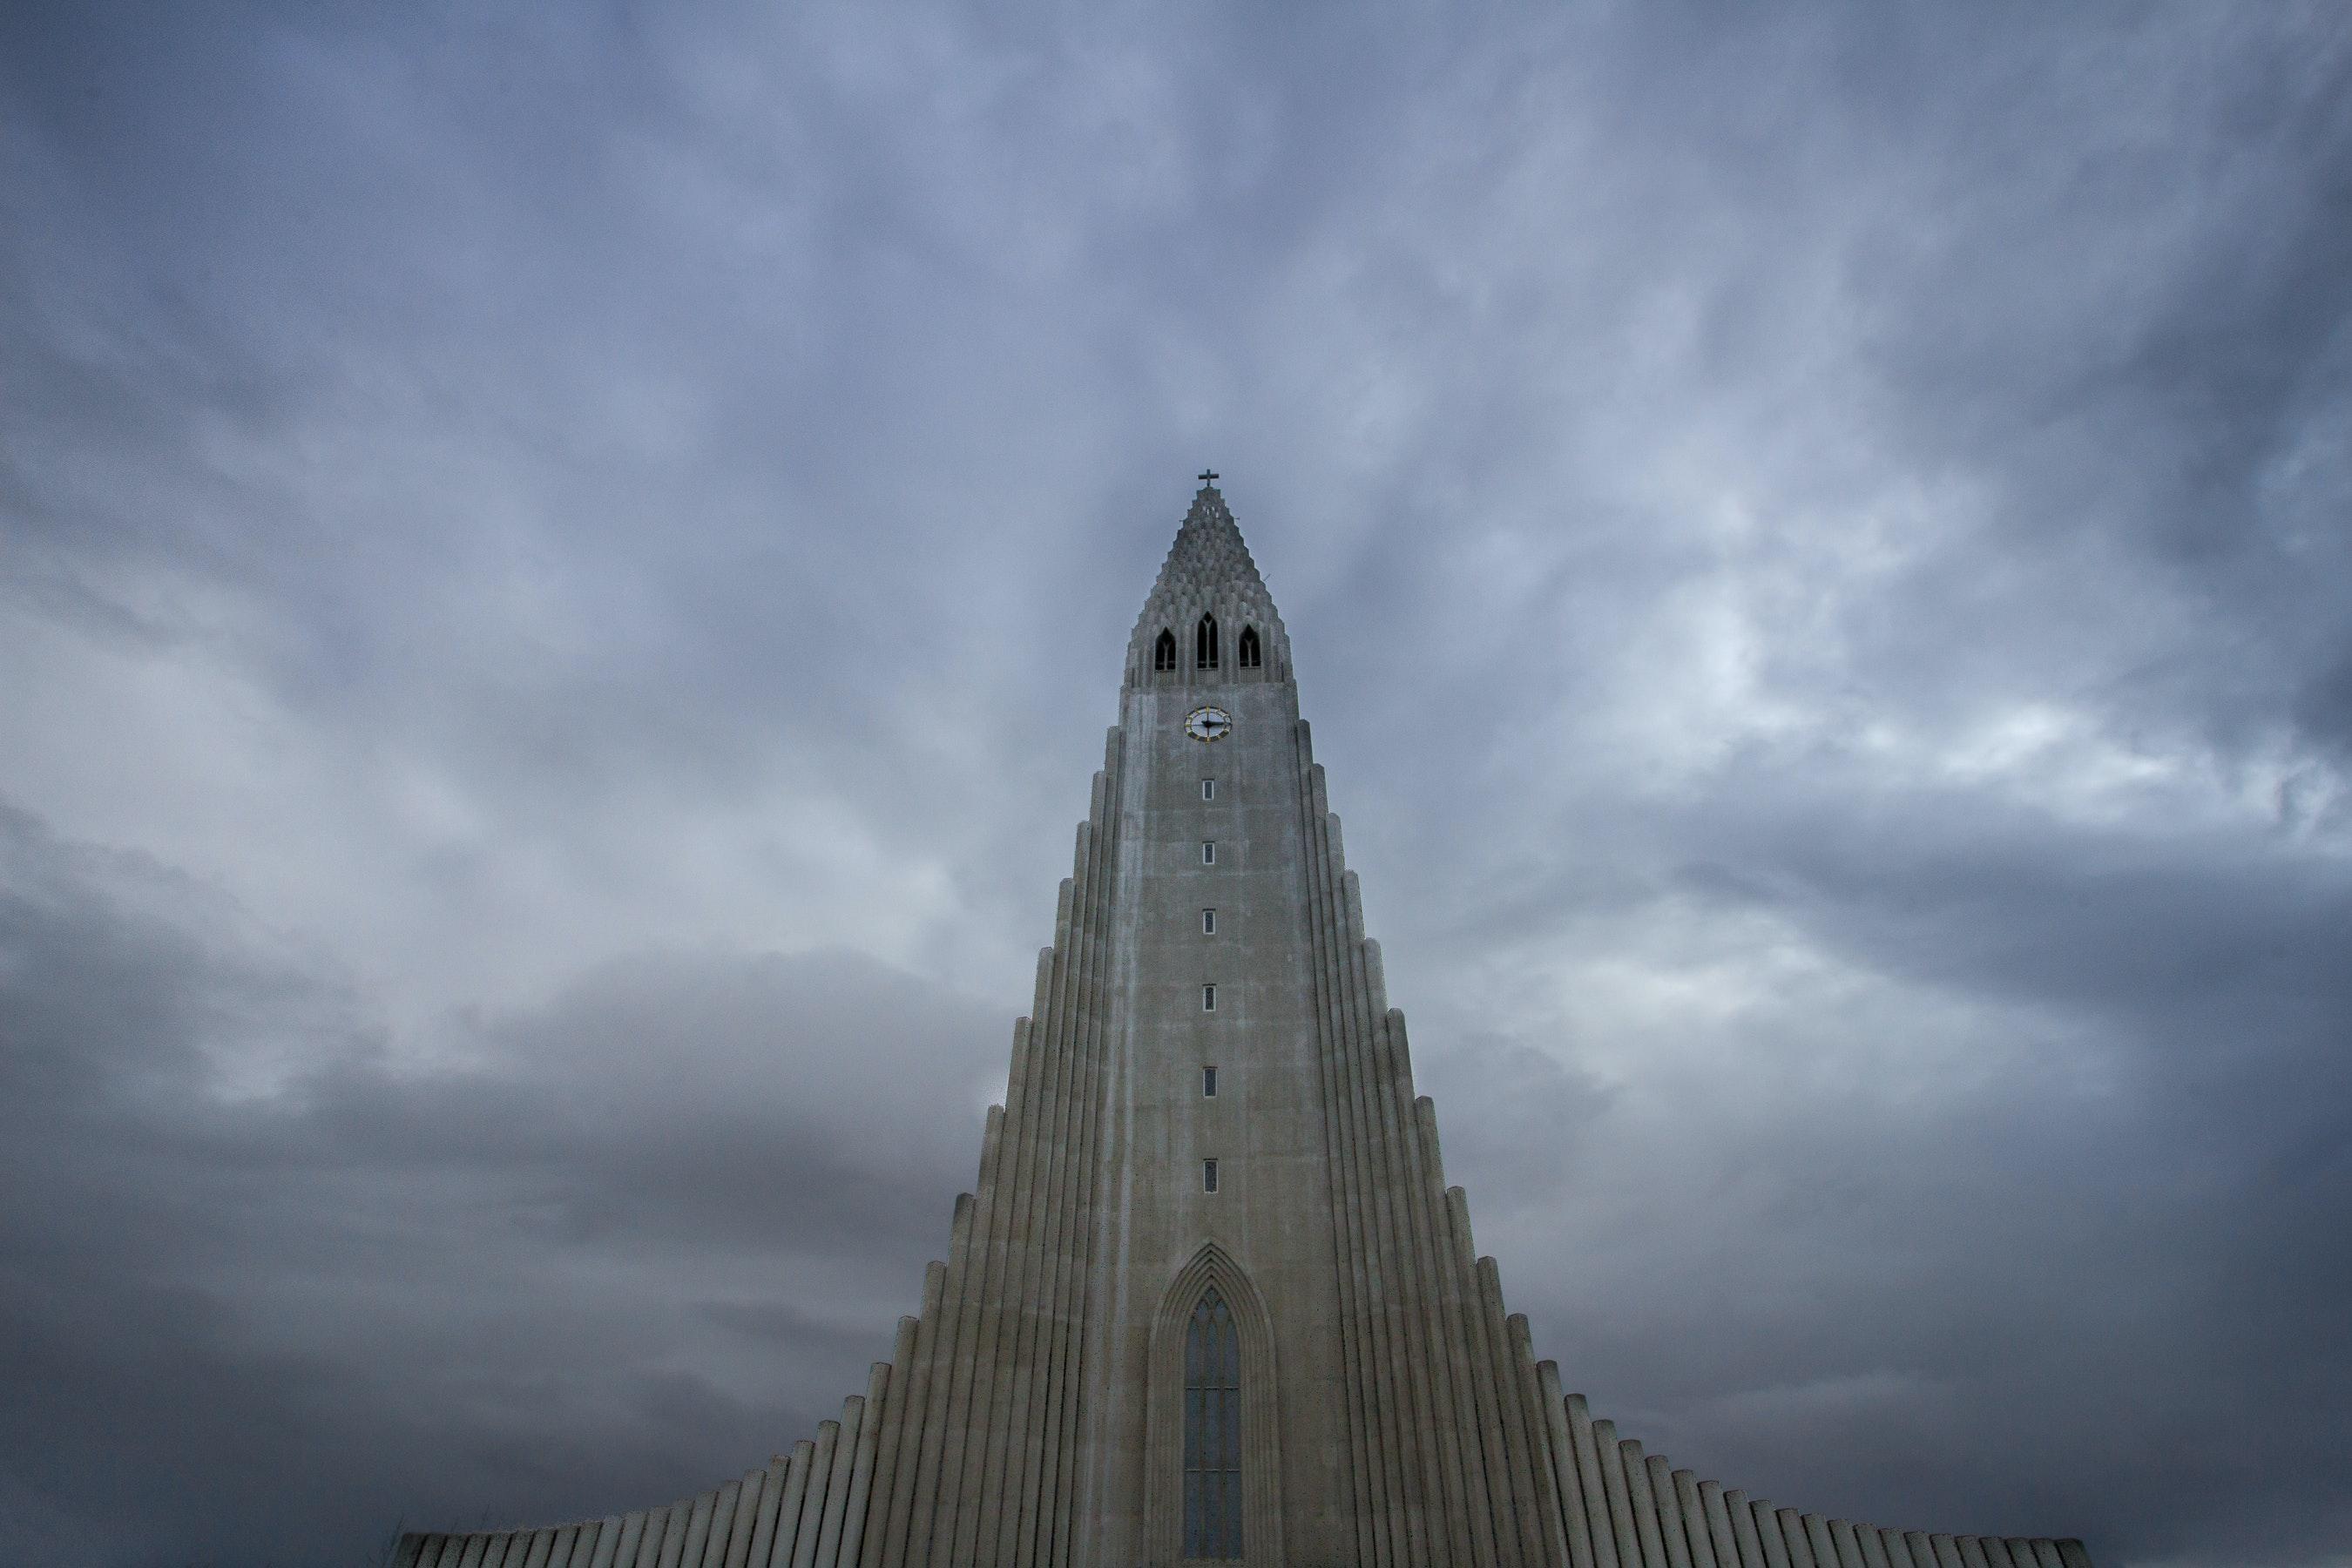 Hallgrímskirkja church in Reykjavík